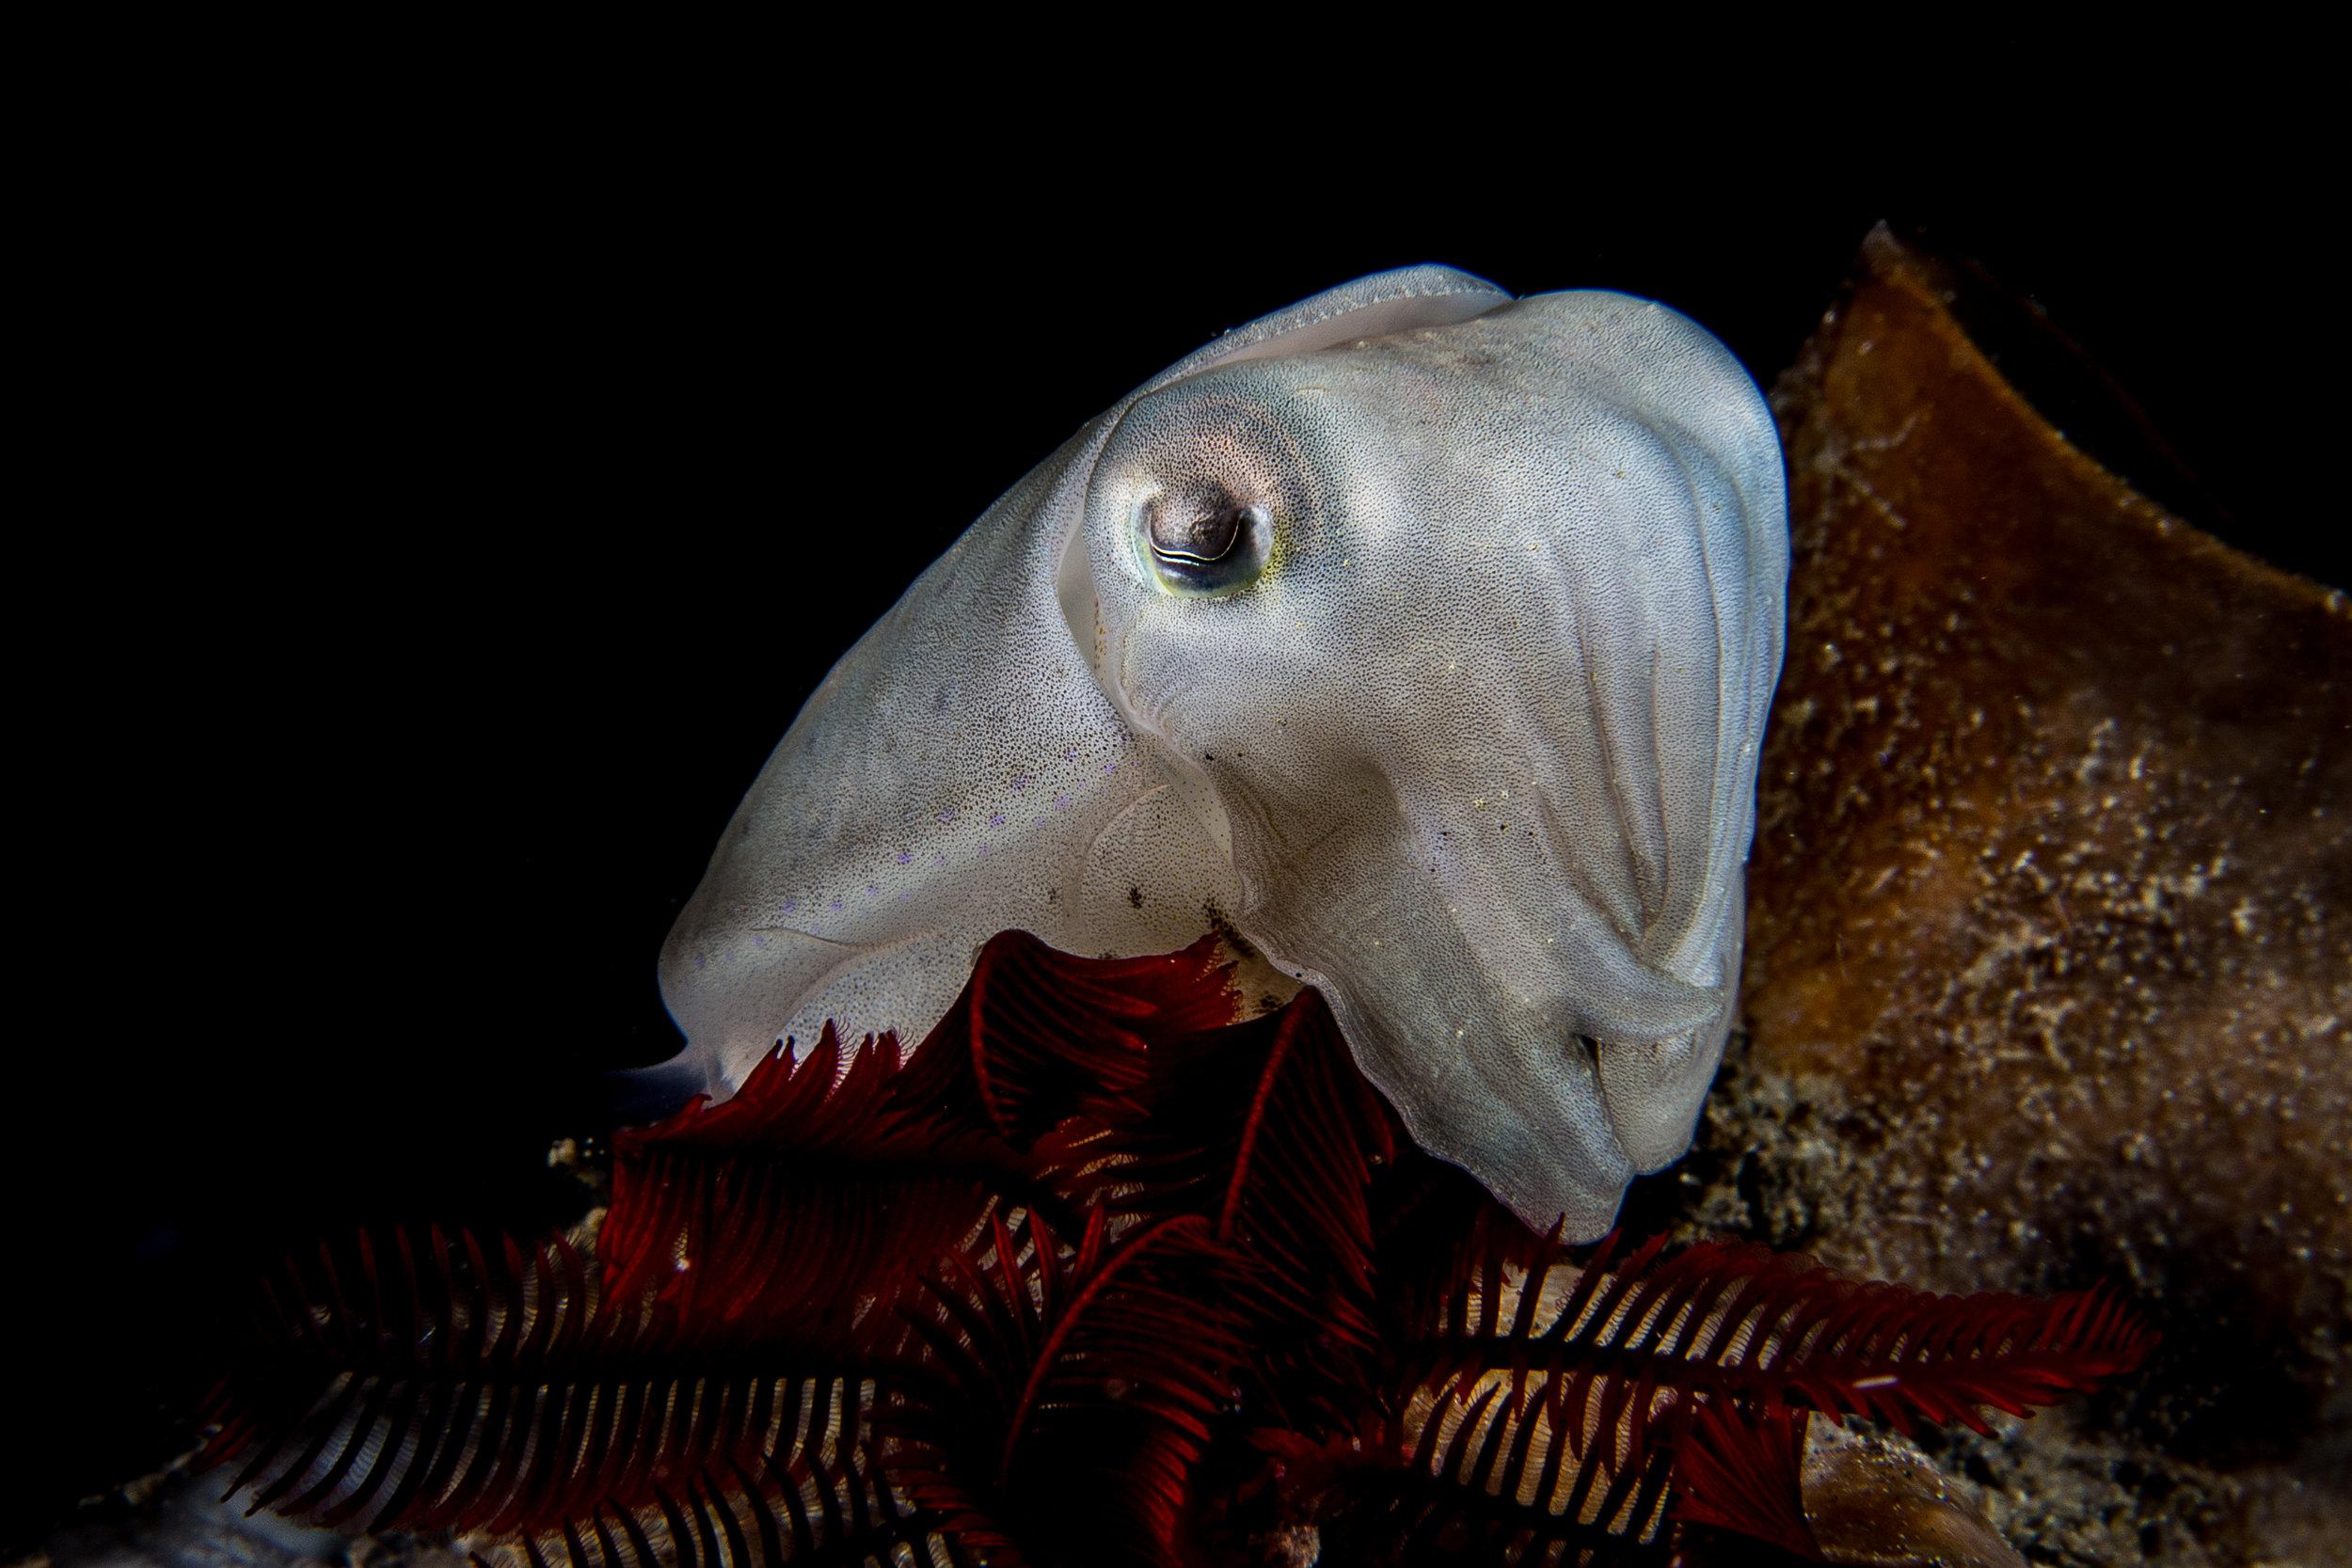 cyttlefish CREDIT: WOJTEK MECZYNSKI / coral reef image bank